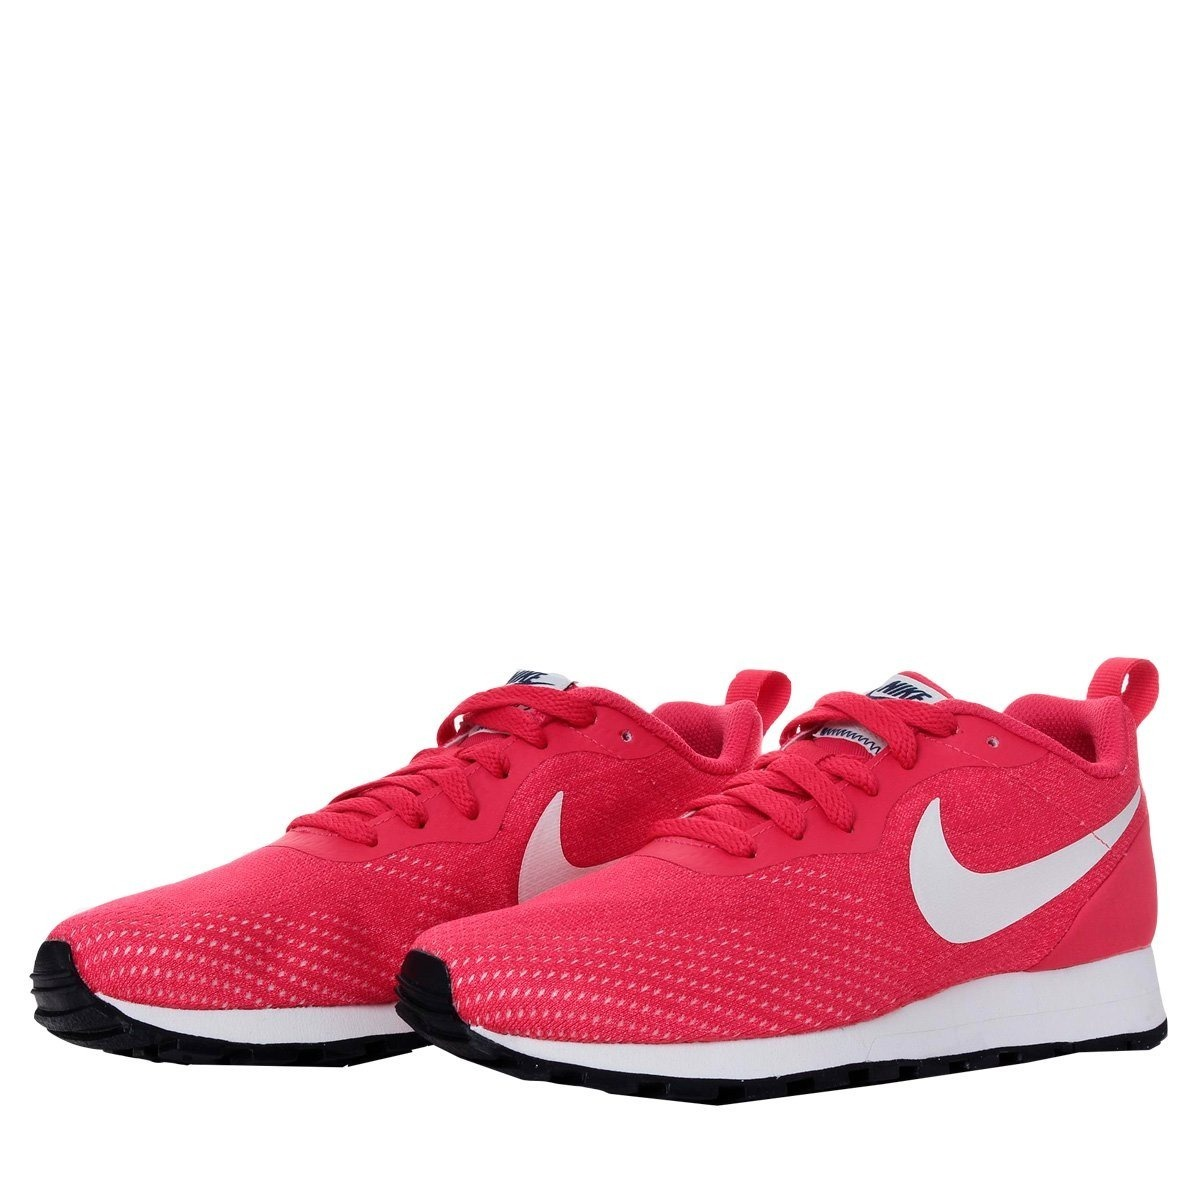 d89cf4073a tênis feminino nike md runner 2 eng mesh 916797-600 original. Carregando  zoom.